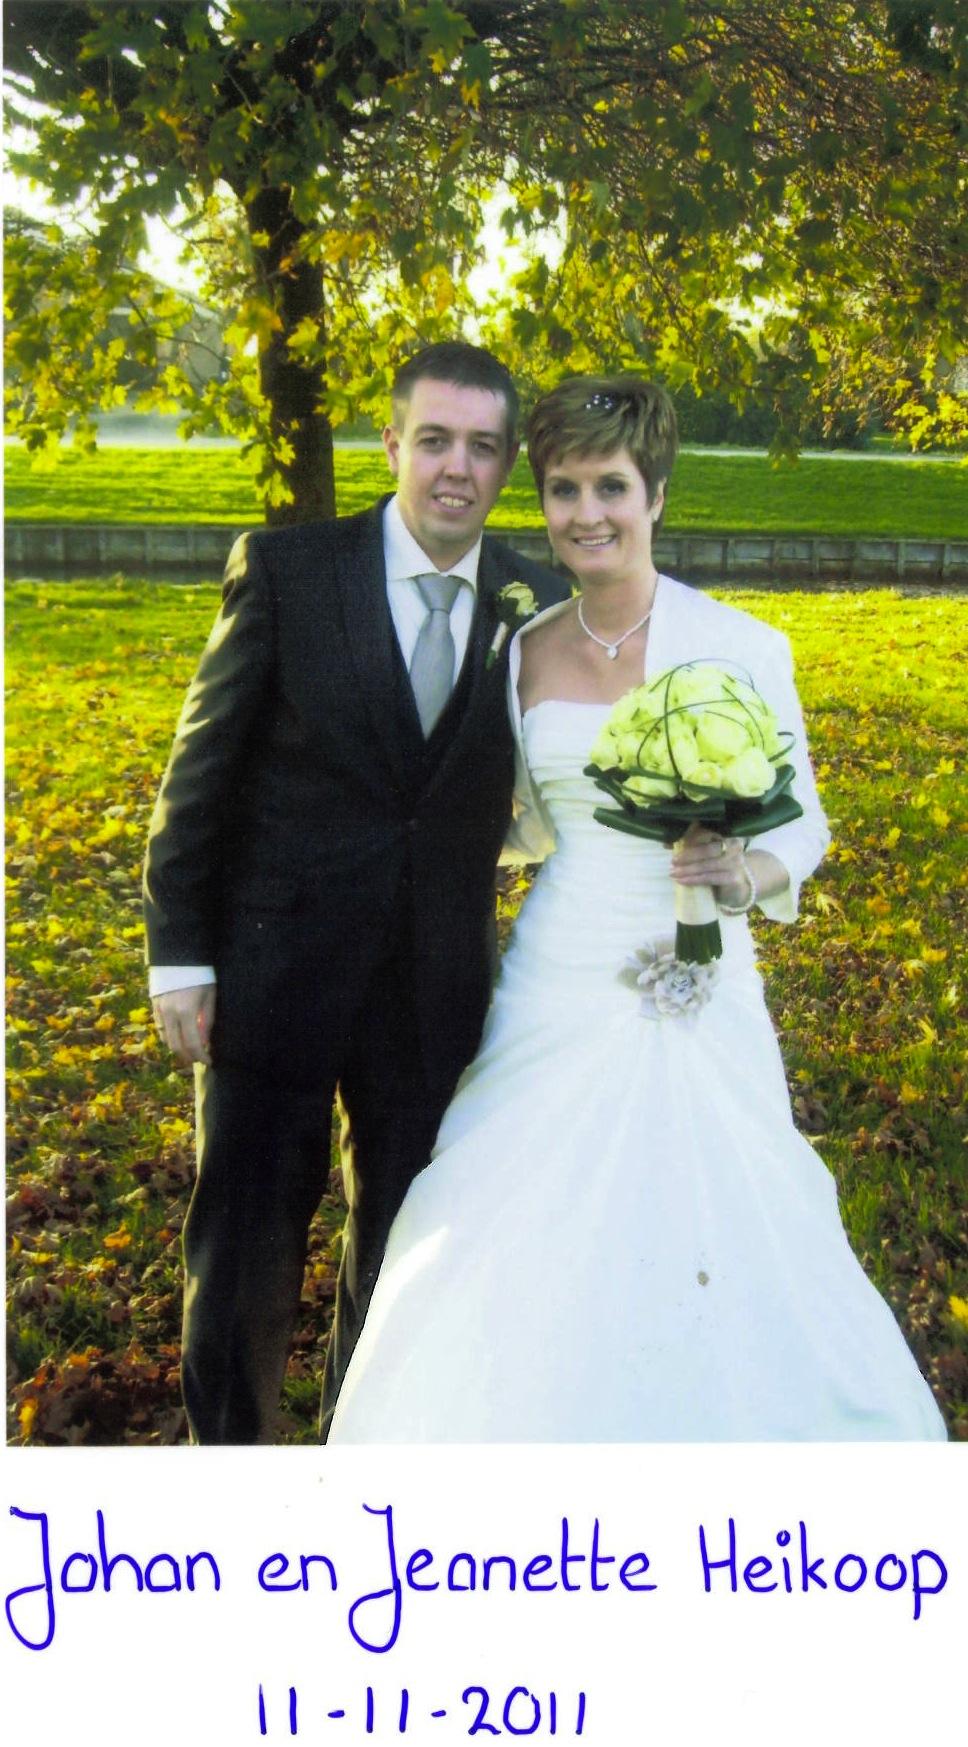 Bruidspaar Johan & Jeanette Heikoop